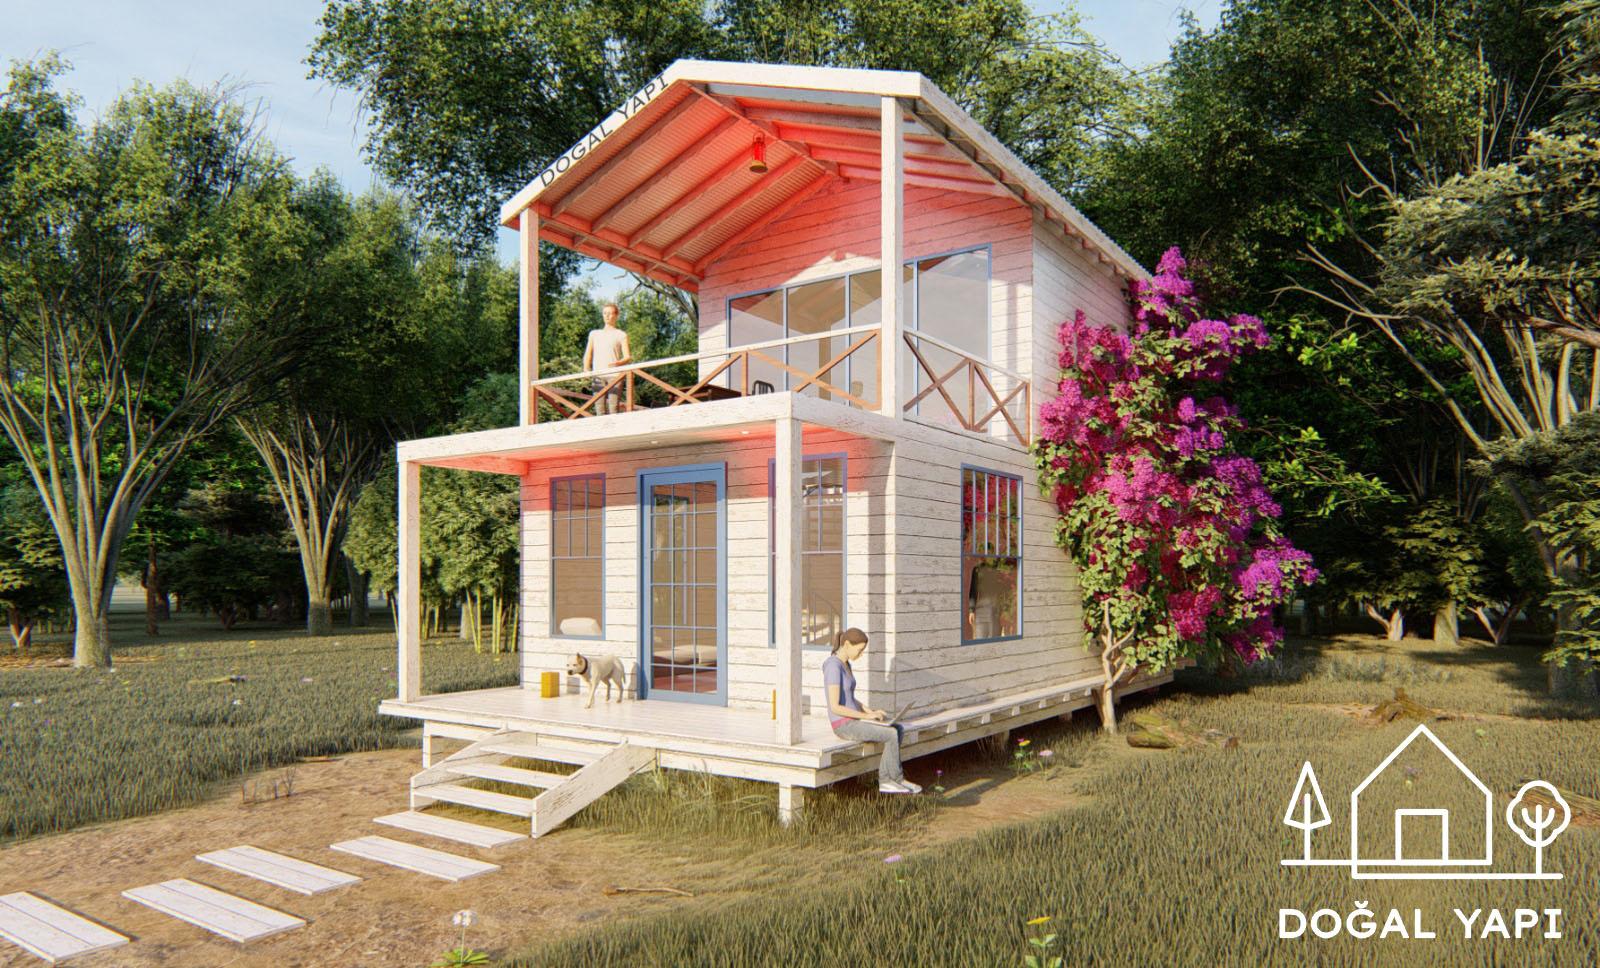 Çiftlik Evi Bodrum - Farmhouse Bodrum